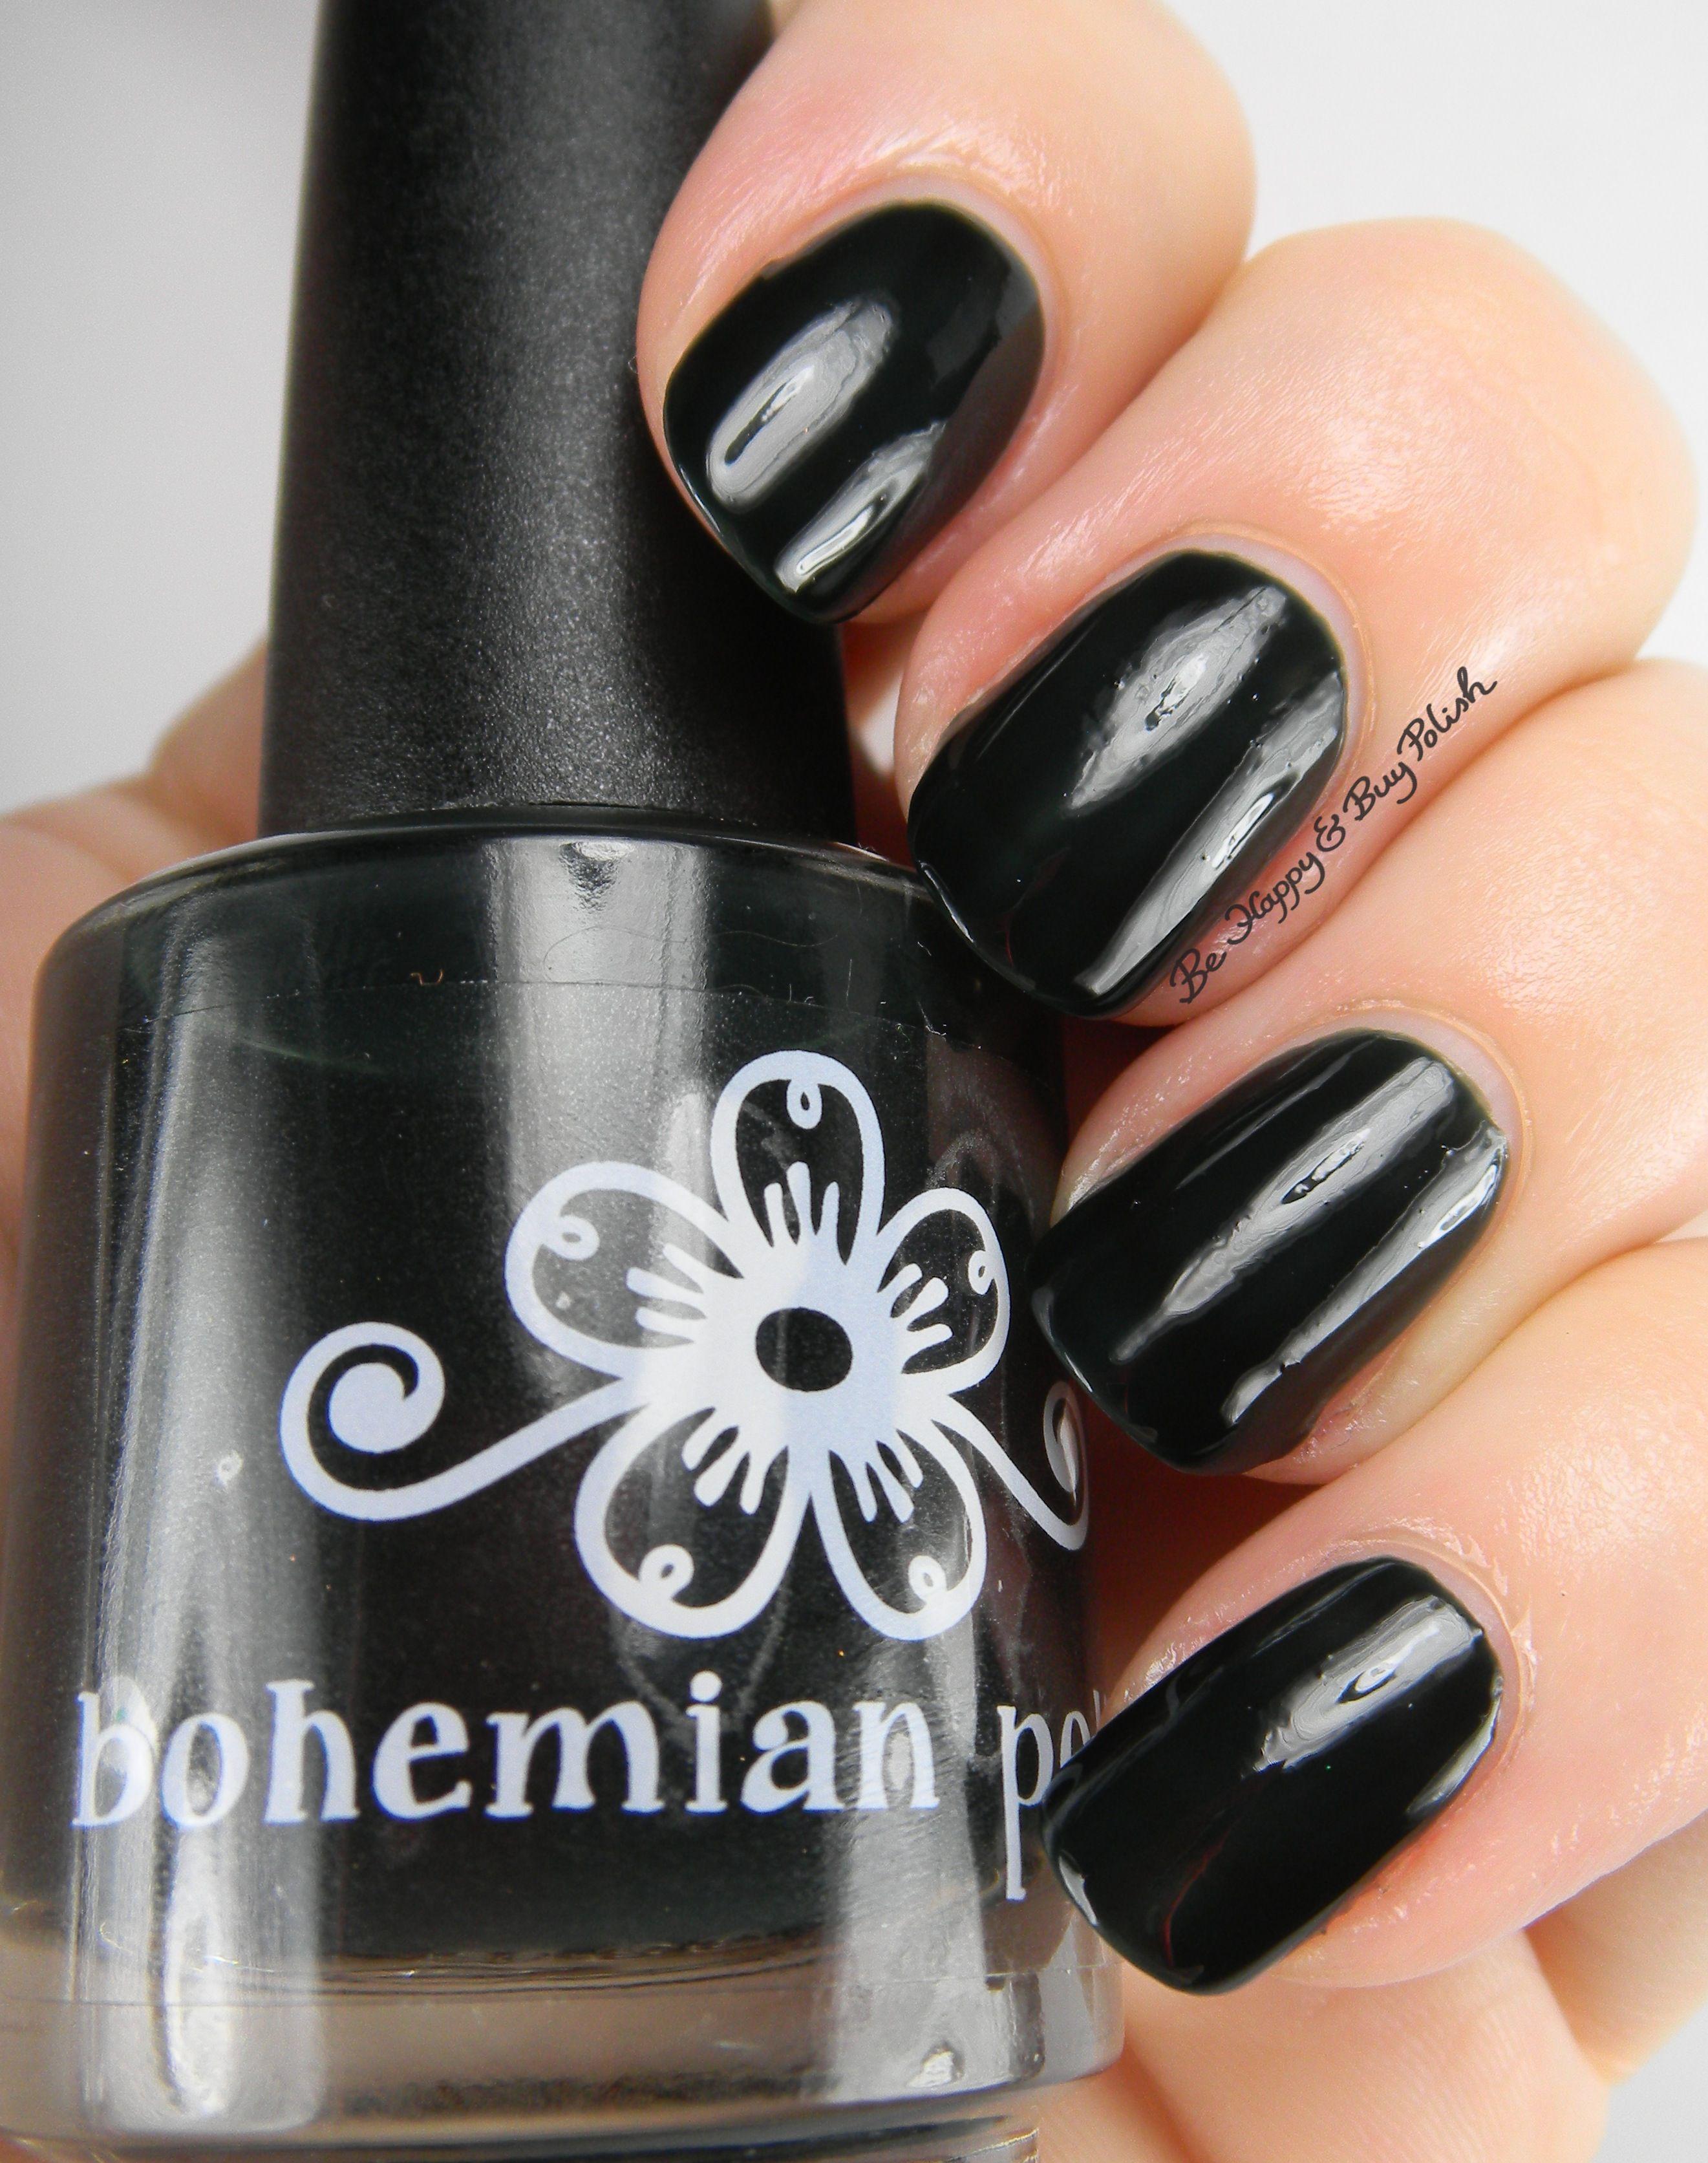 Bohemian Polish Adirondack Winter Collection Swatch and